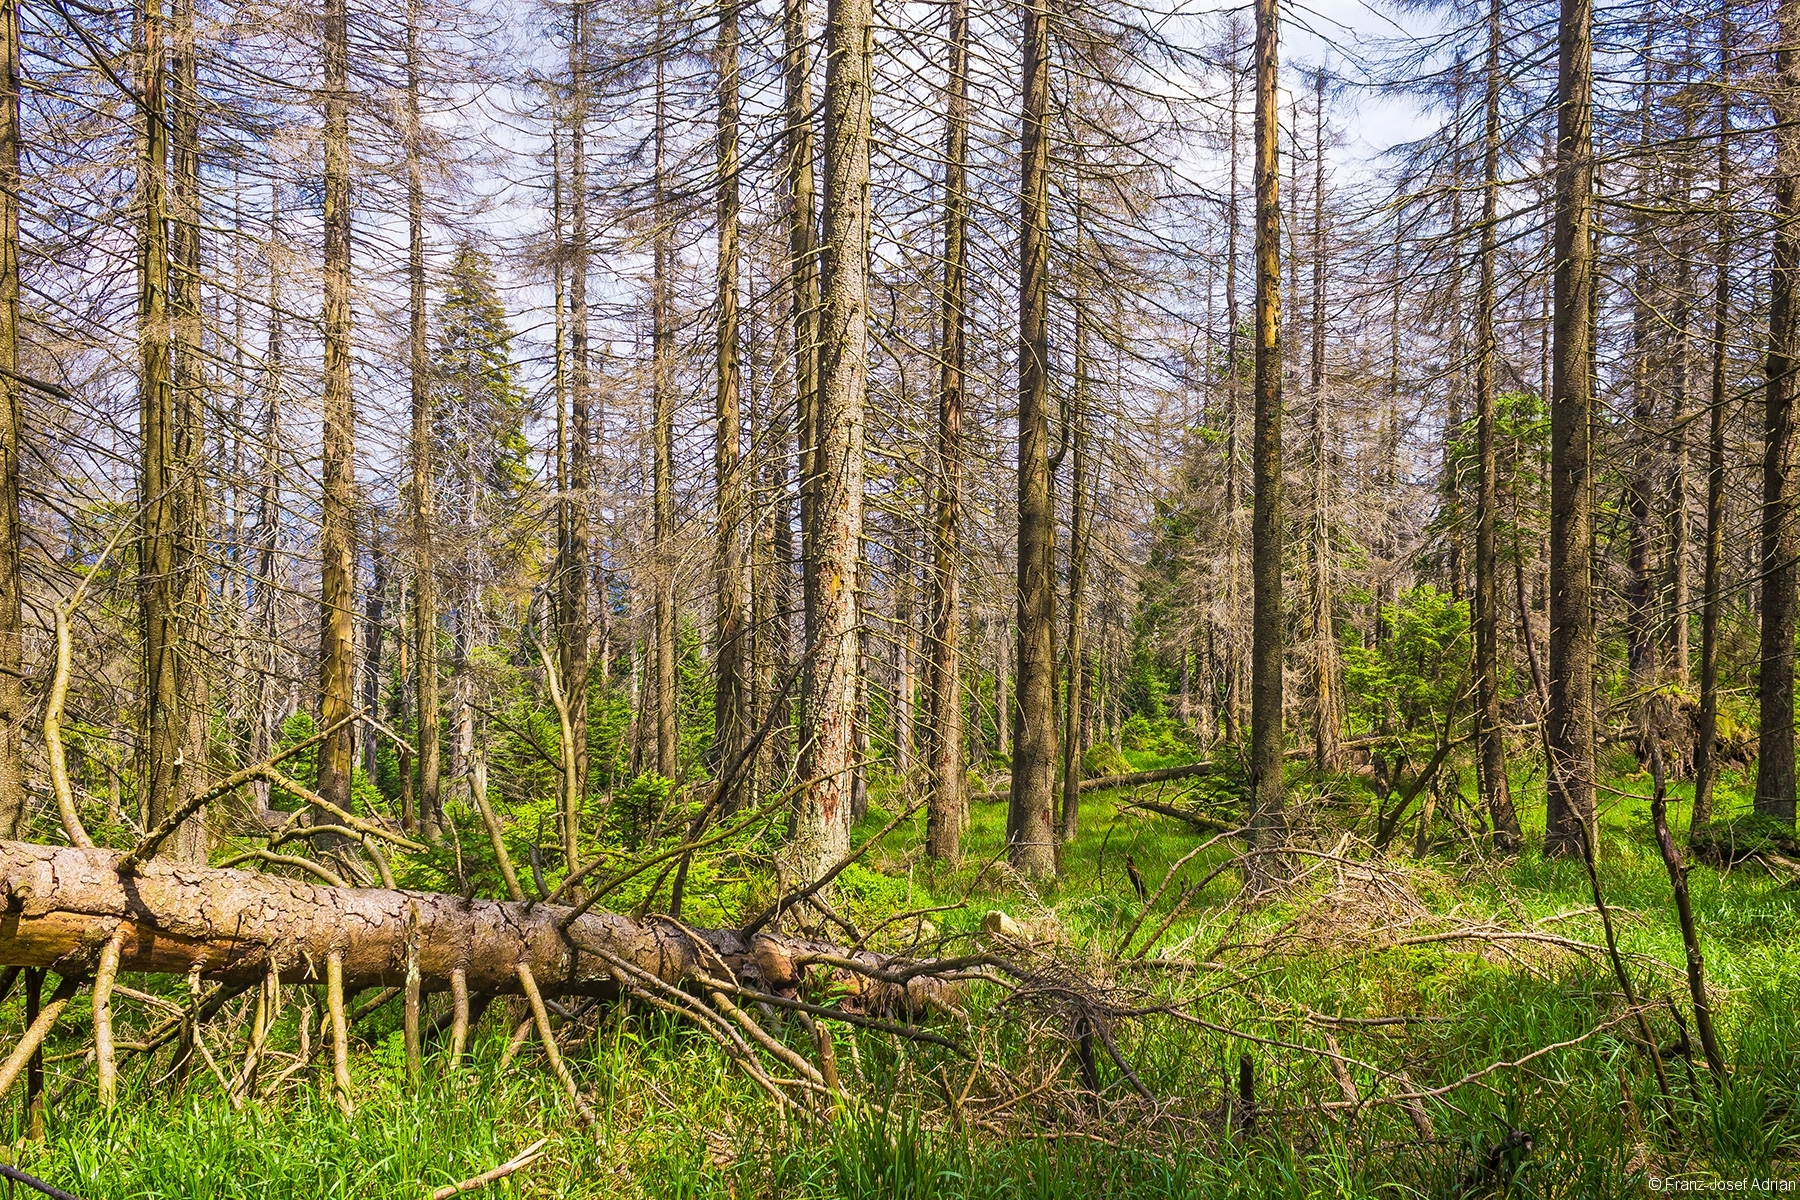 grobästiges Fichtentotholz